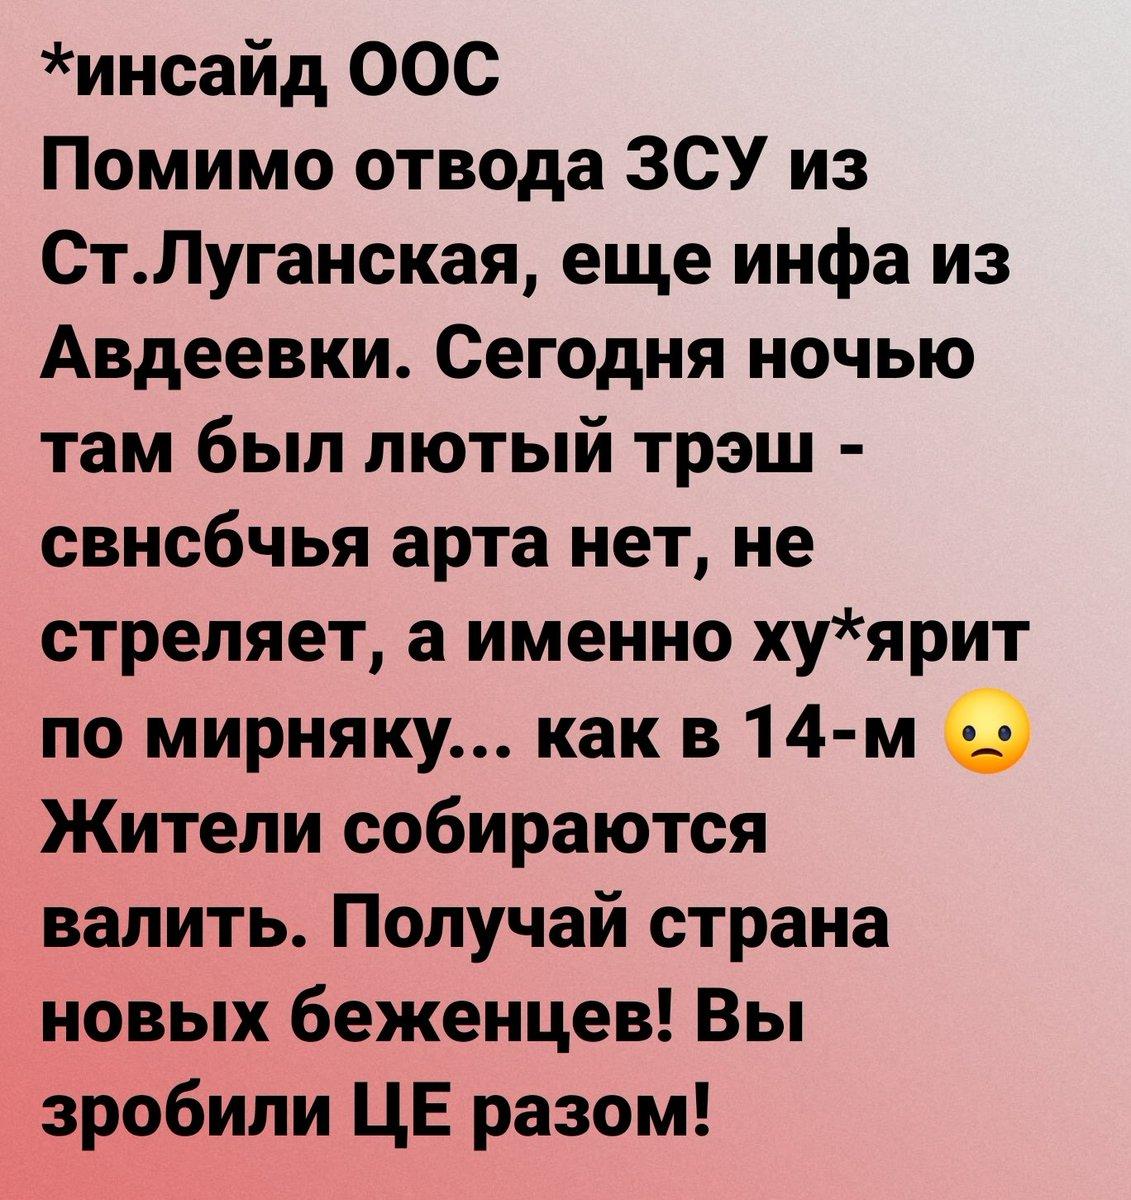 С начала суток 27 июня ранен один воин. Враг 18 раз нарушил перемирие, - штаб ООС - Цензор.НЕТ 8954